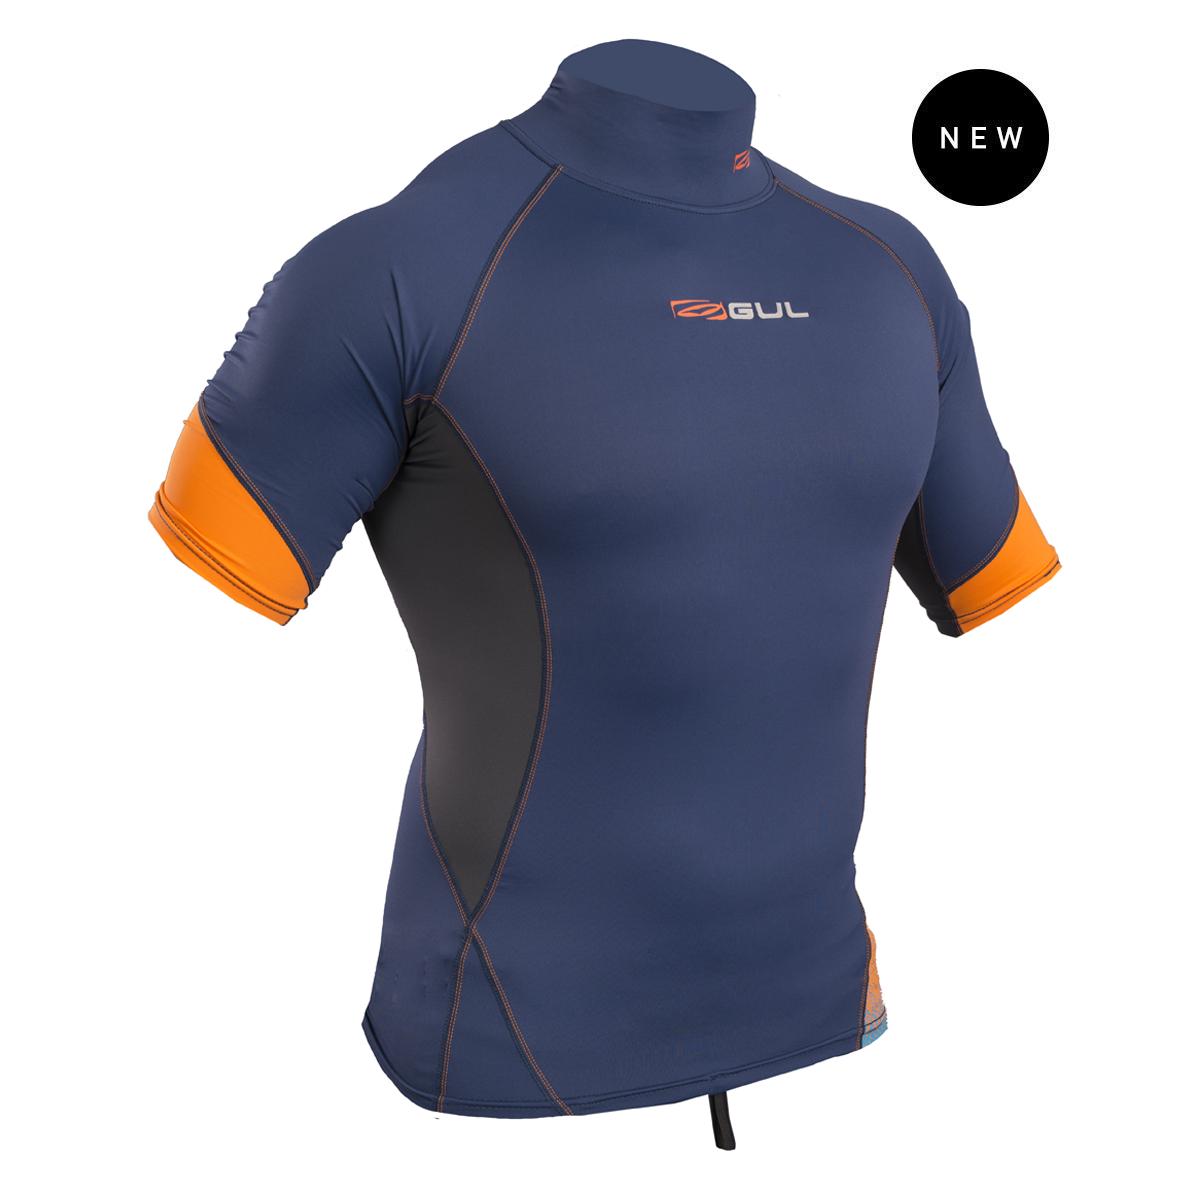 Gul Xola Fl Short Sleeve Rashguard   Rg0338-B4